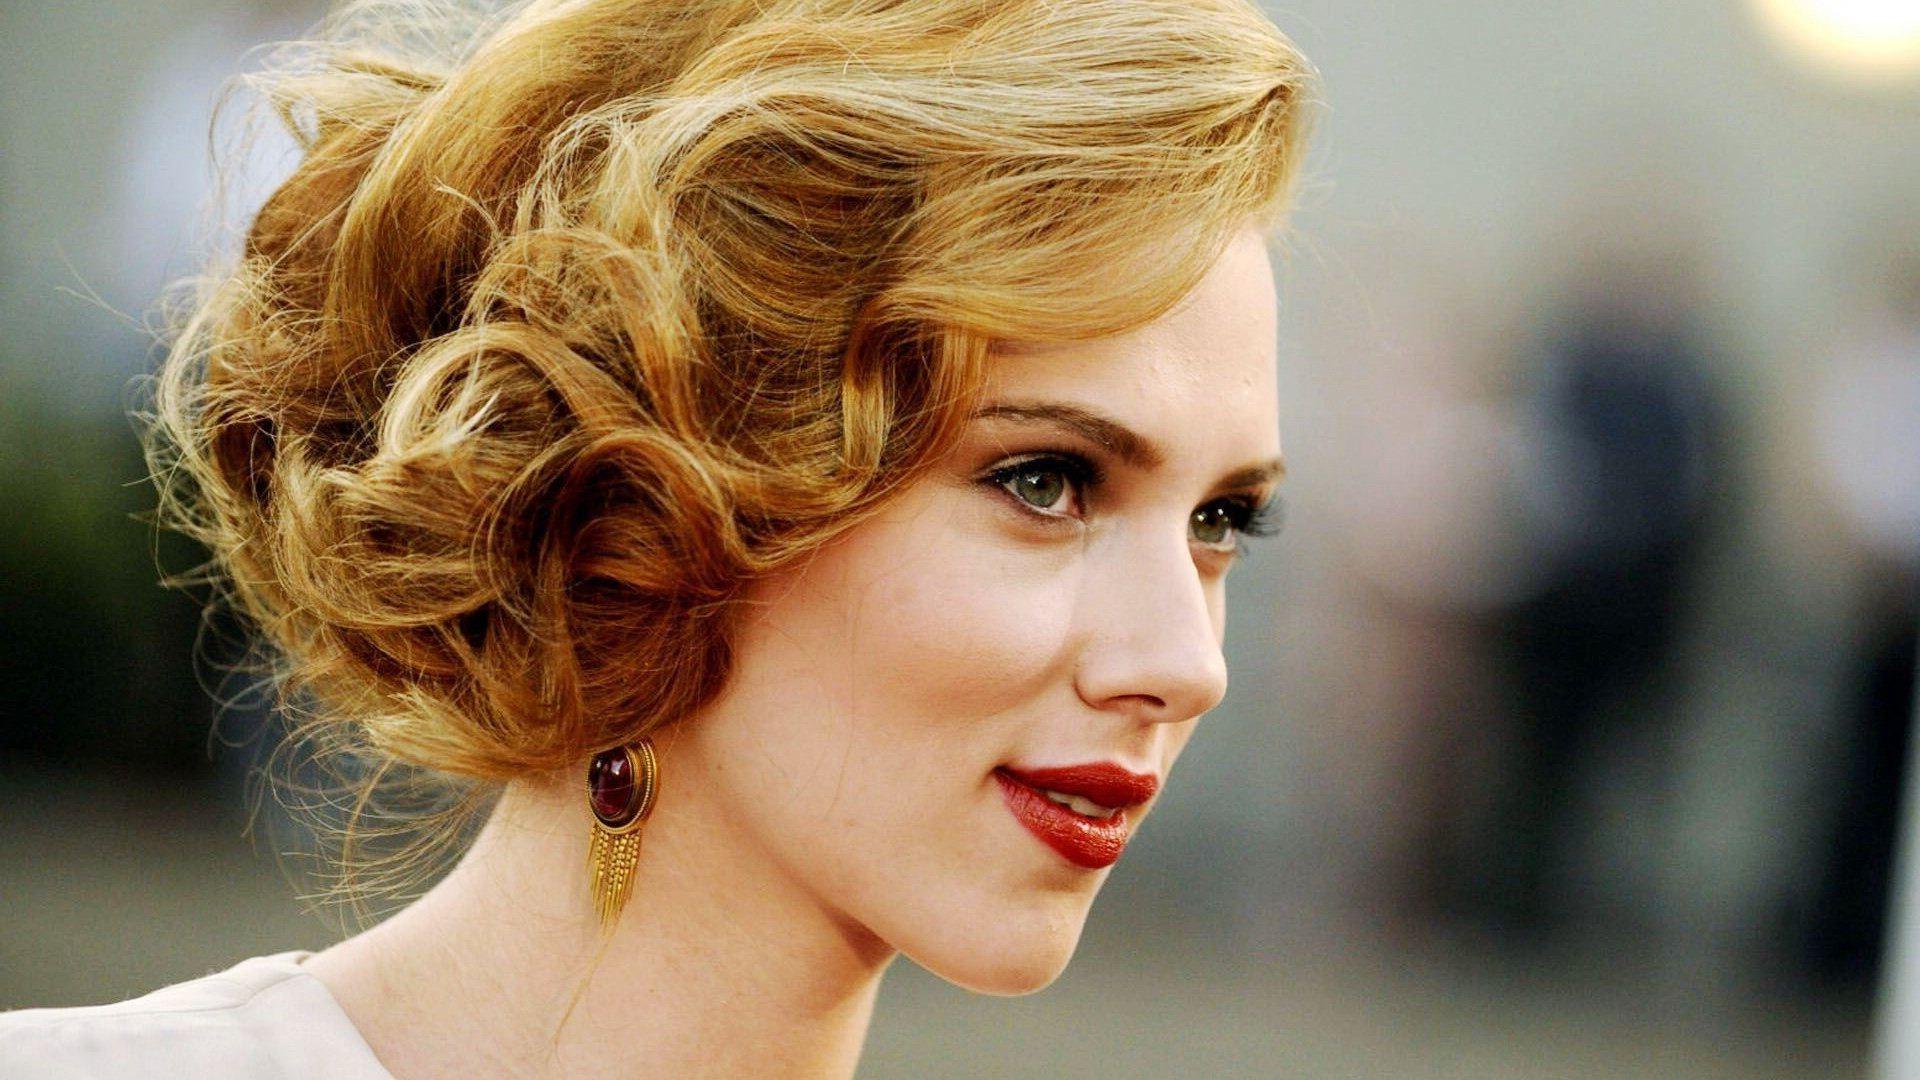 Scarlett Johansson High Quality